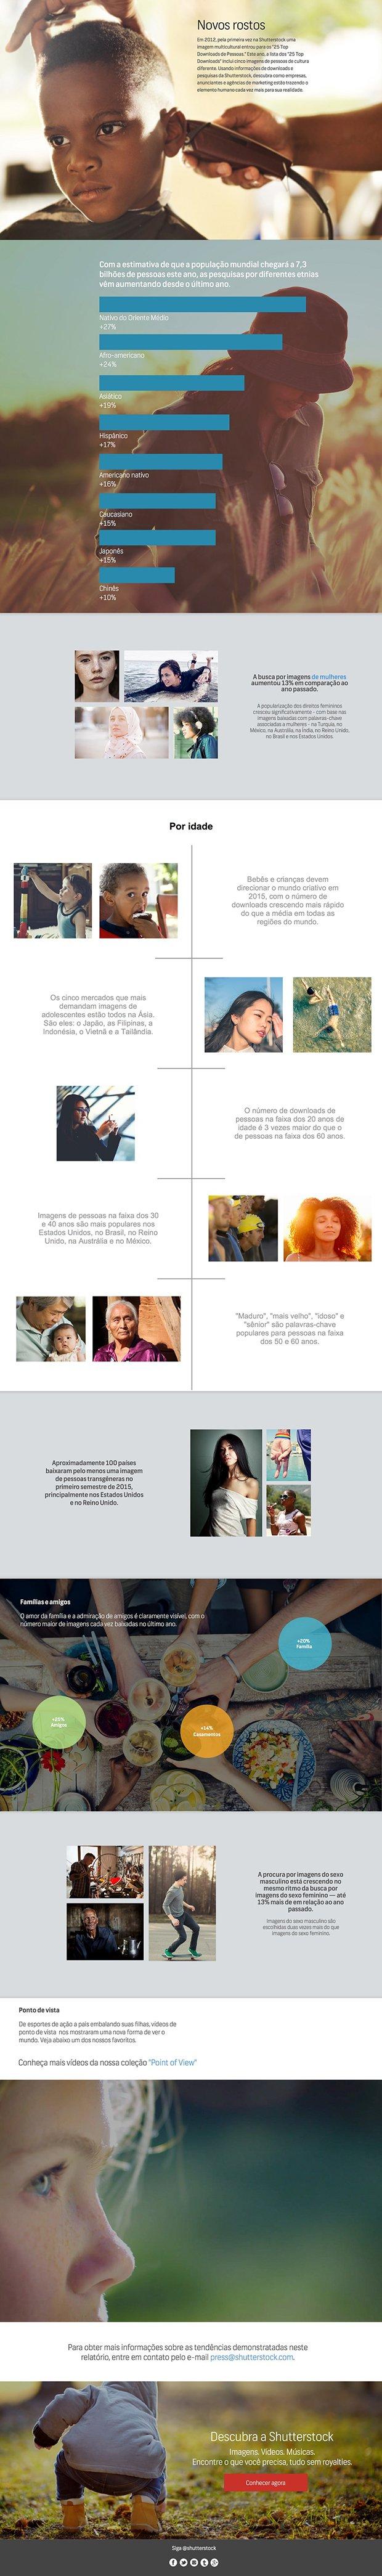 ChangingFaces-Infographic-PT-2